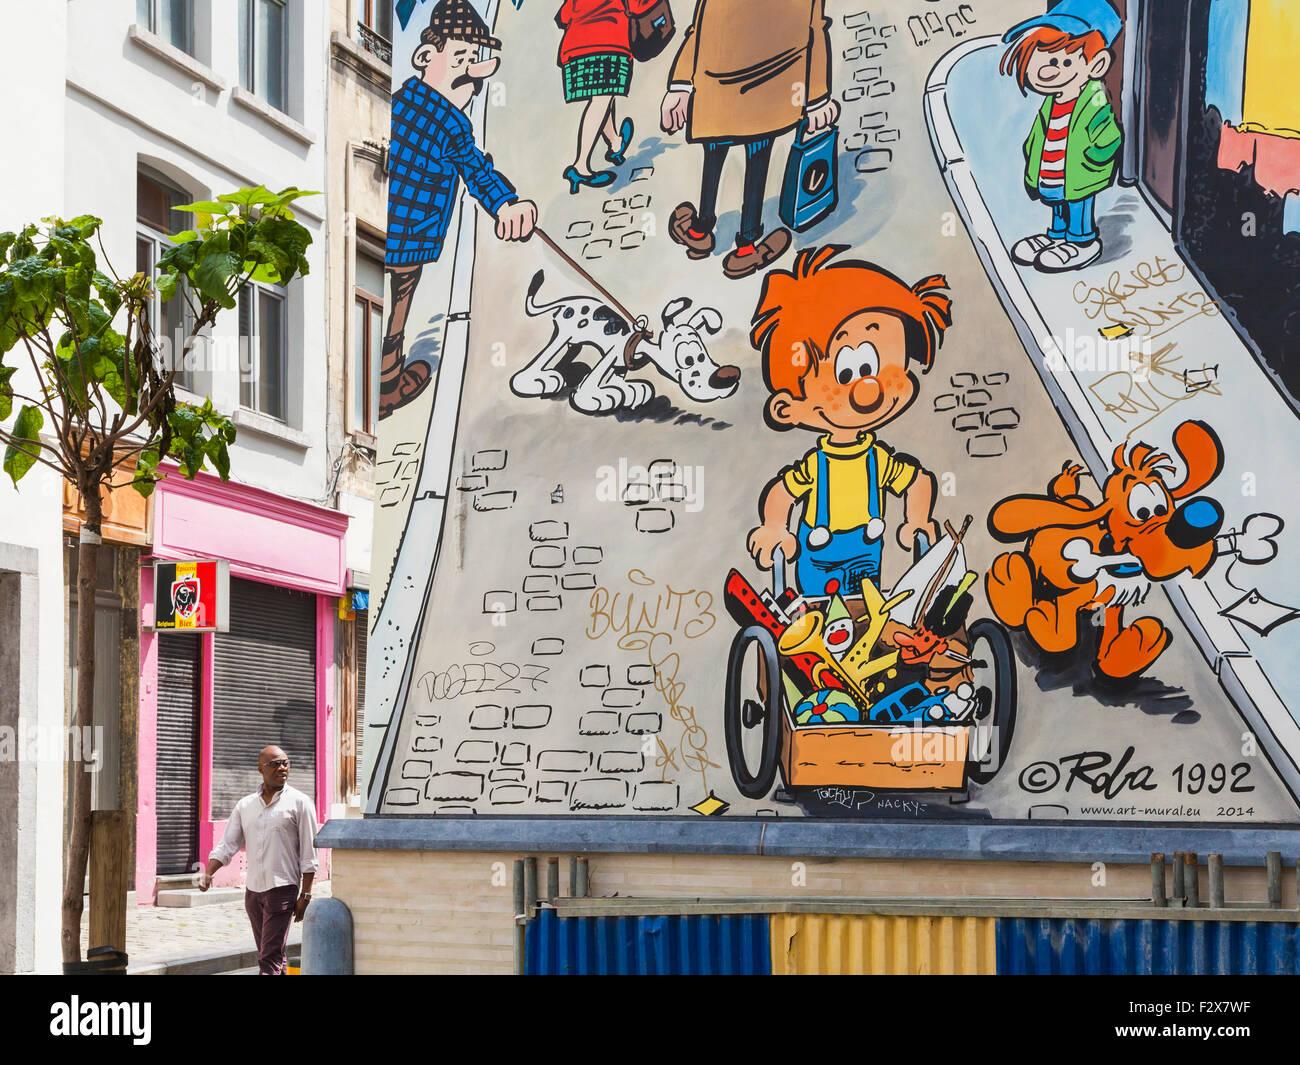 Belgien, Brüssel, Fassade des Hauses mit Comic-Strip von Jean Roba Stockbild